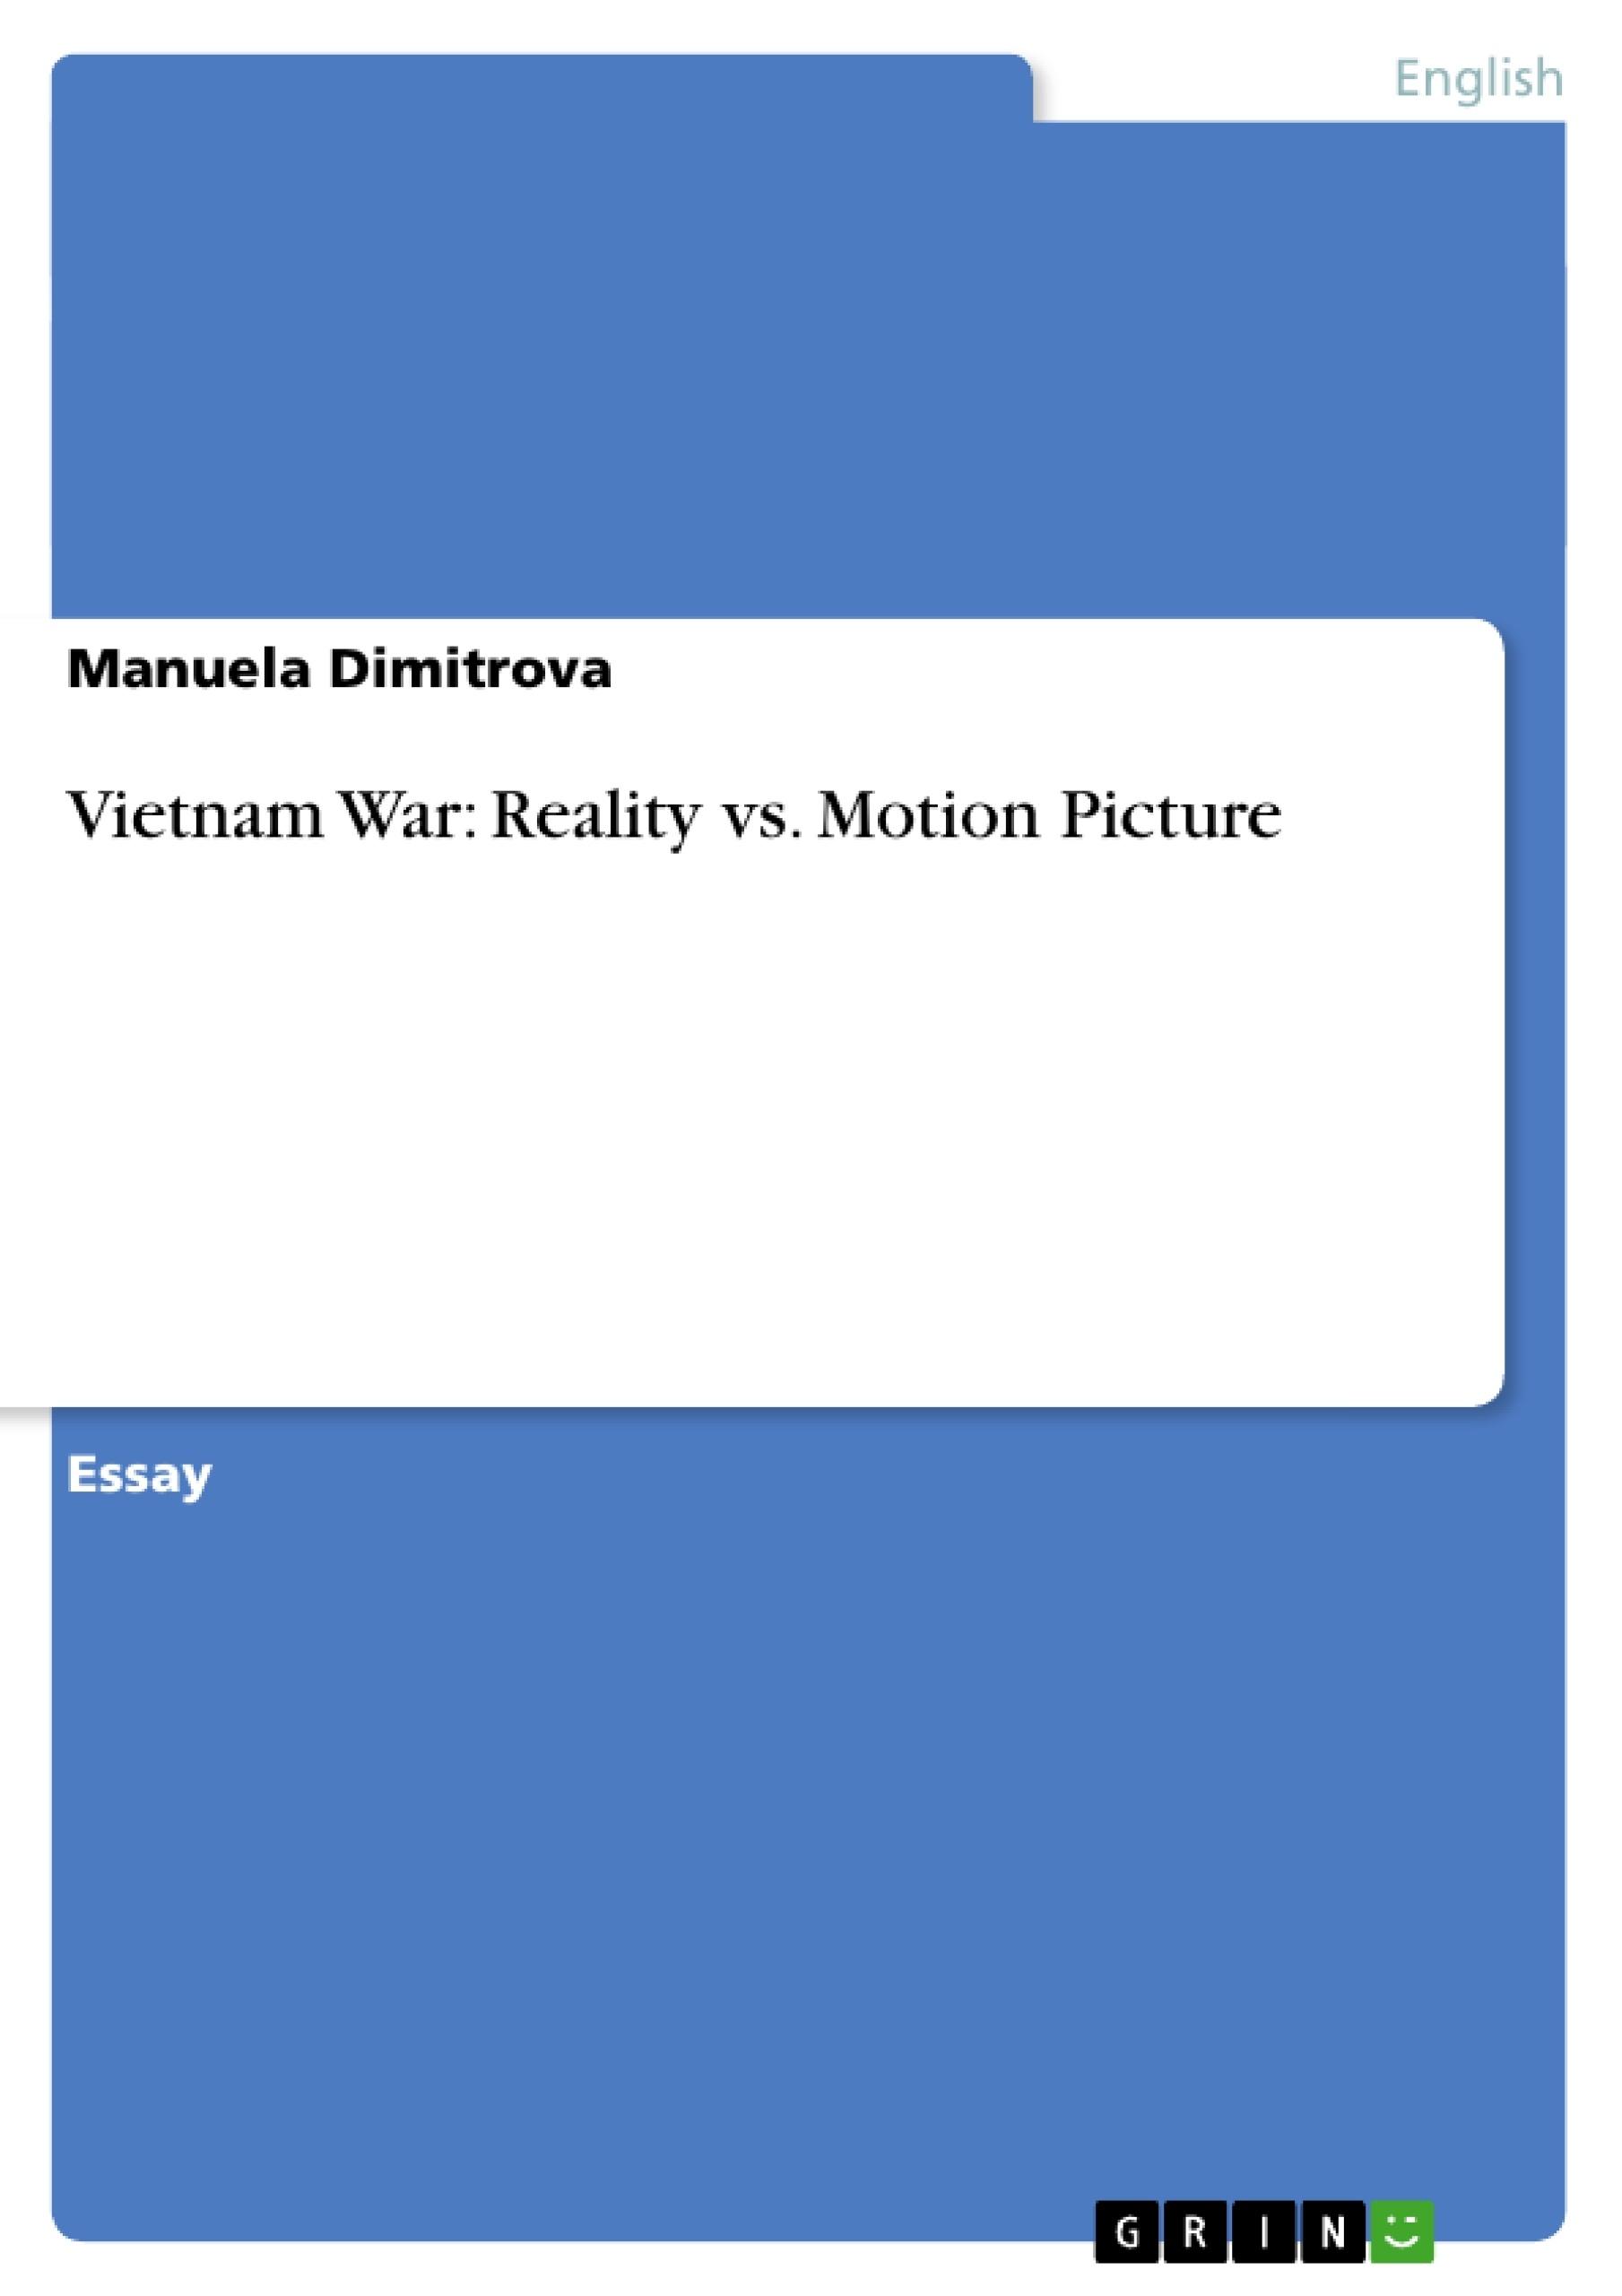 Title: Vietnam War: Reality vs. Motion Picture